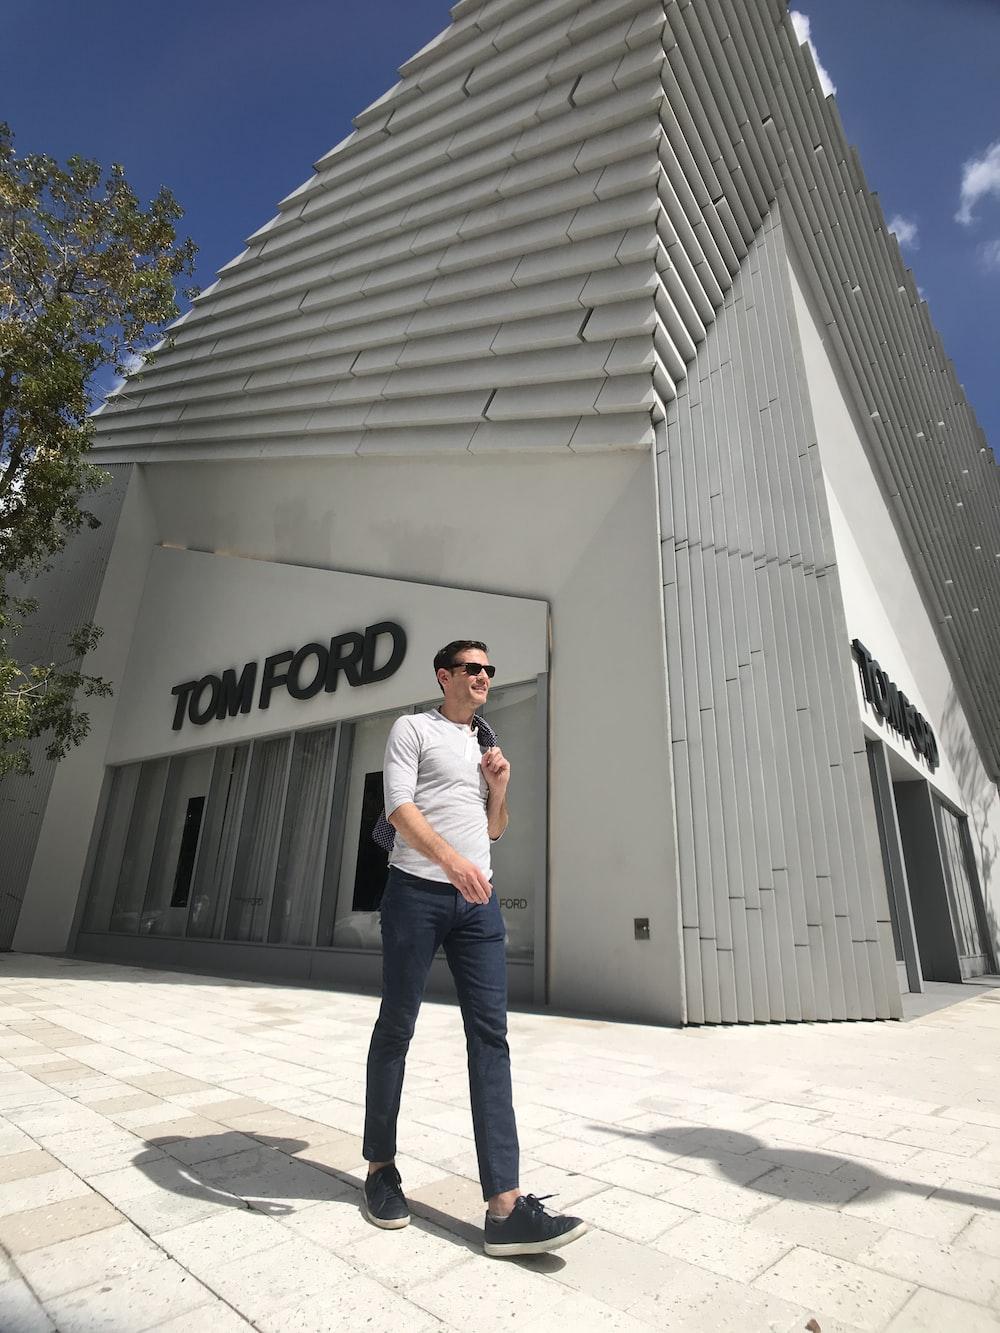 man walking near Tom Ford building